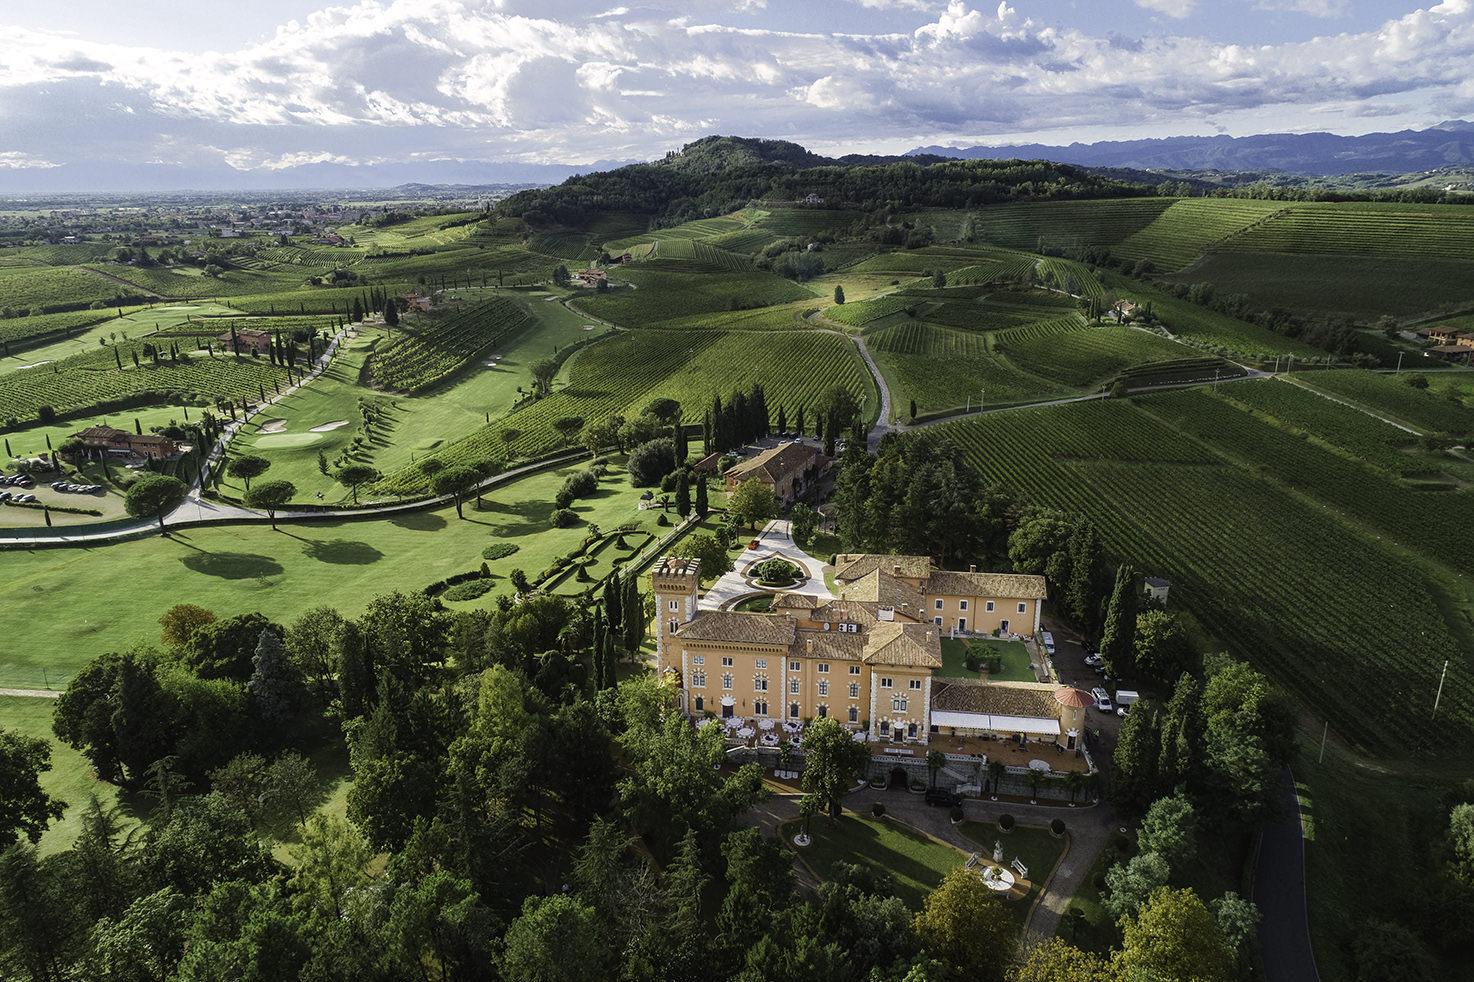 Aerial view of Castello di Spessa